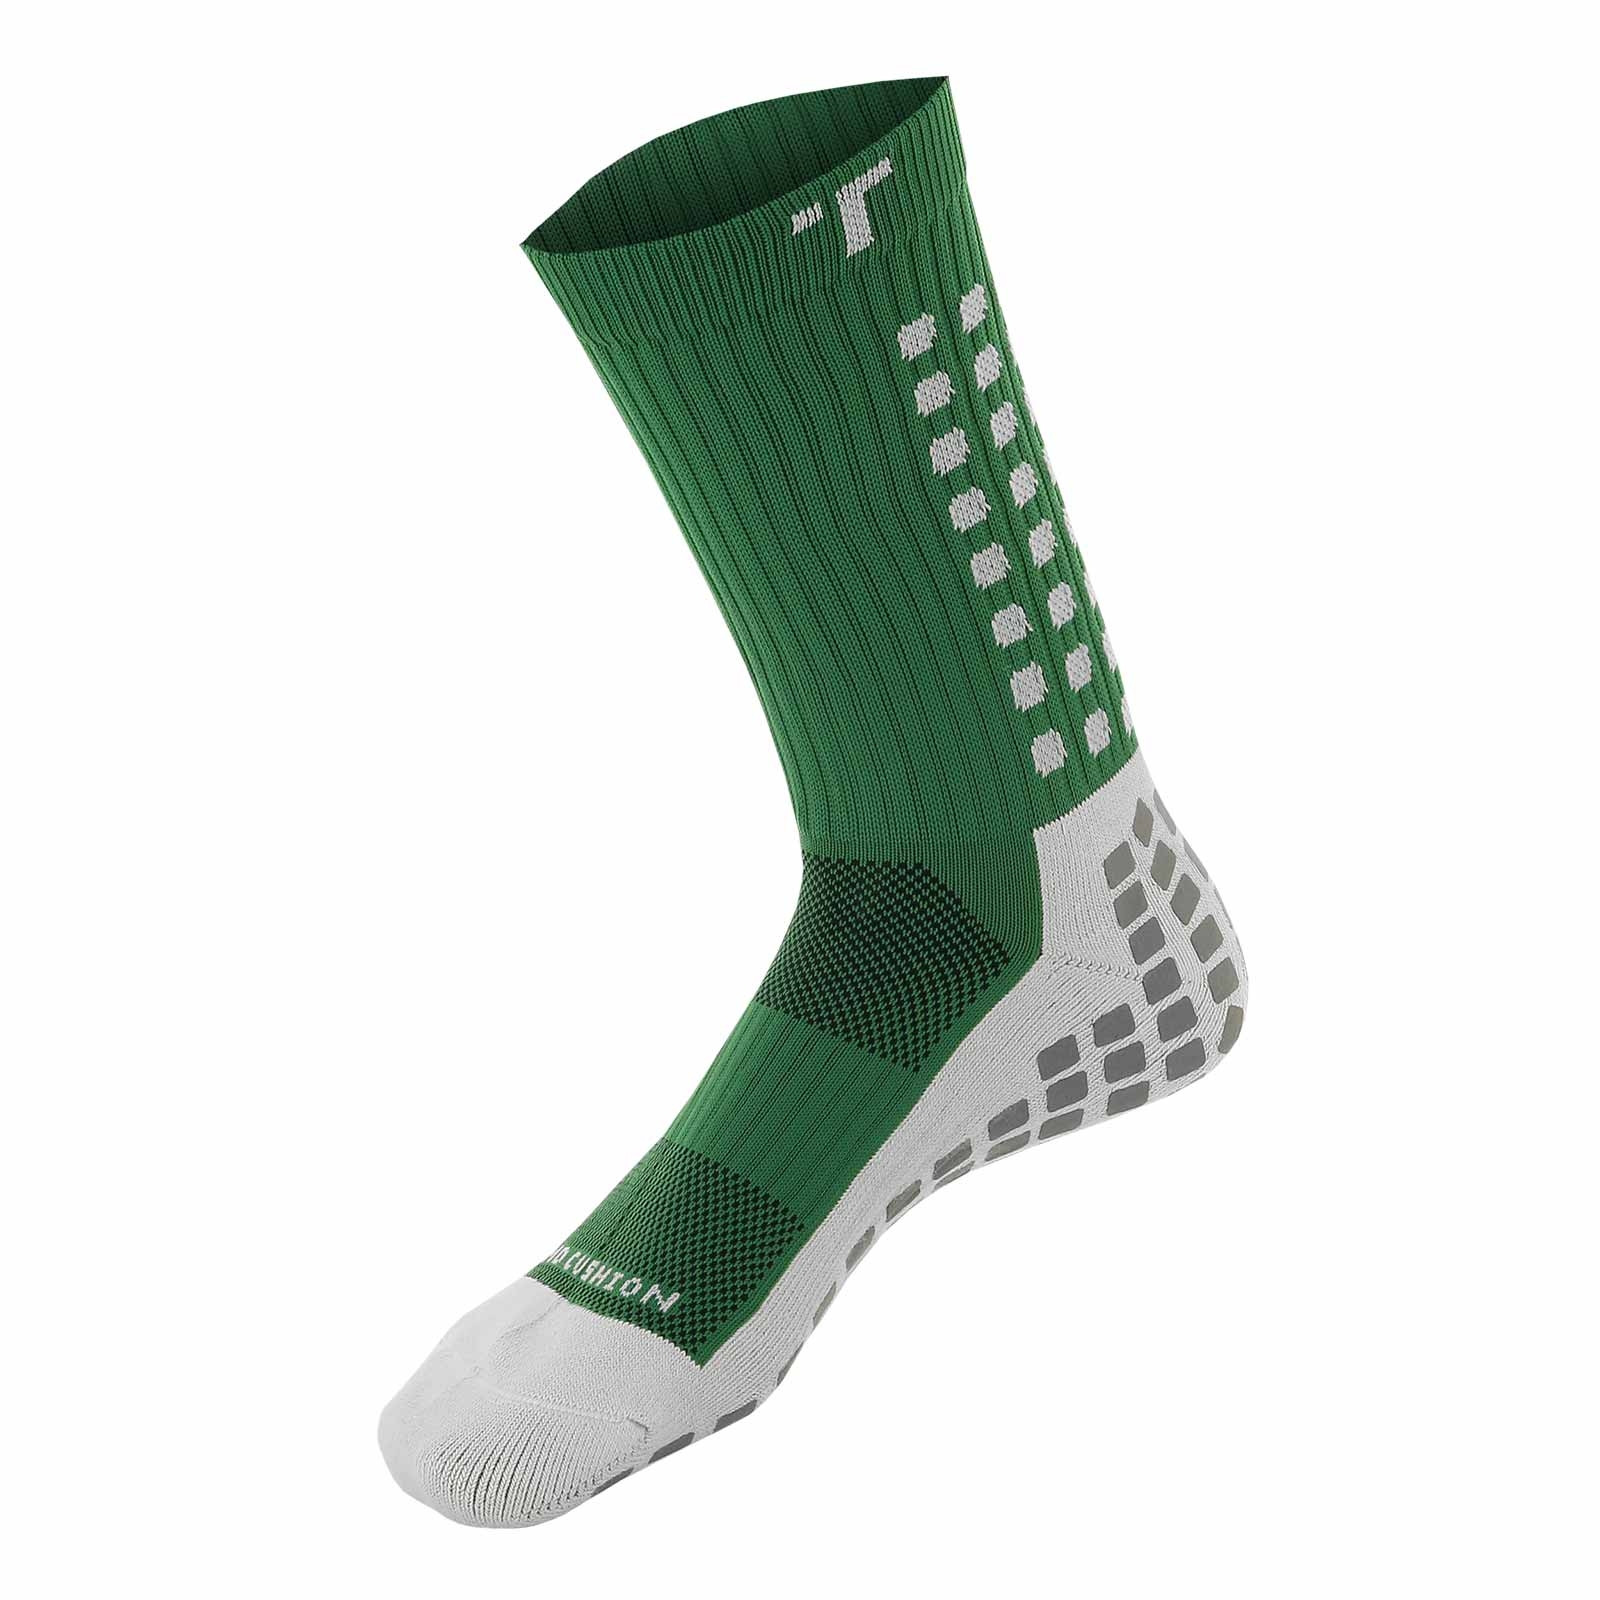 Calcetines antideslizantes Trusox verde | futbolmania